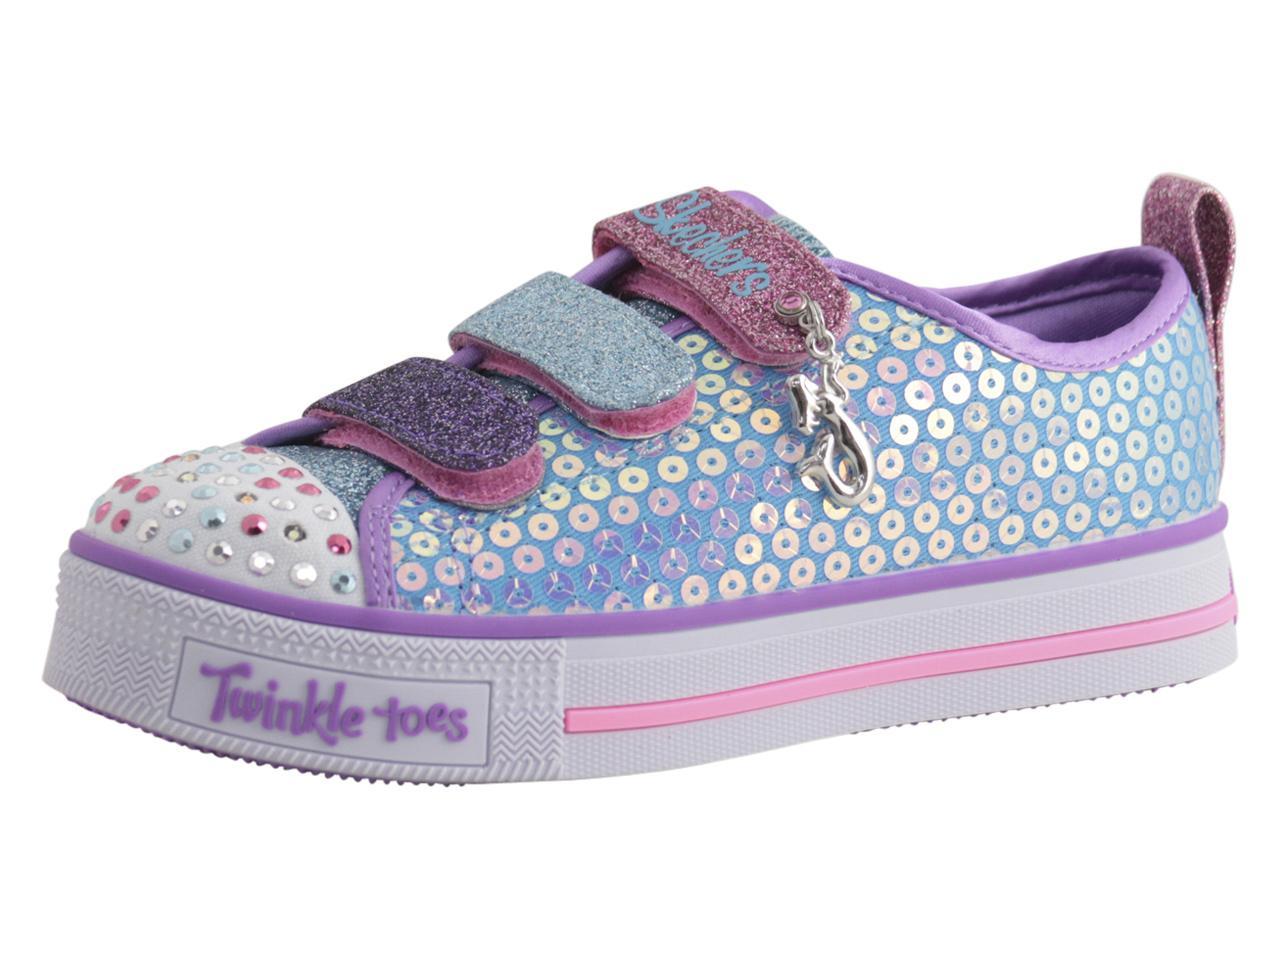 441d77c9d5bed Skechers Little Girl's Twinkle Lite Mermaid Magic Light Up Sneakers Shoes